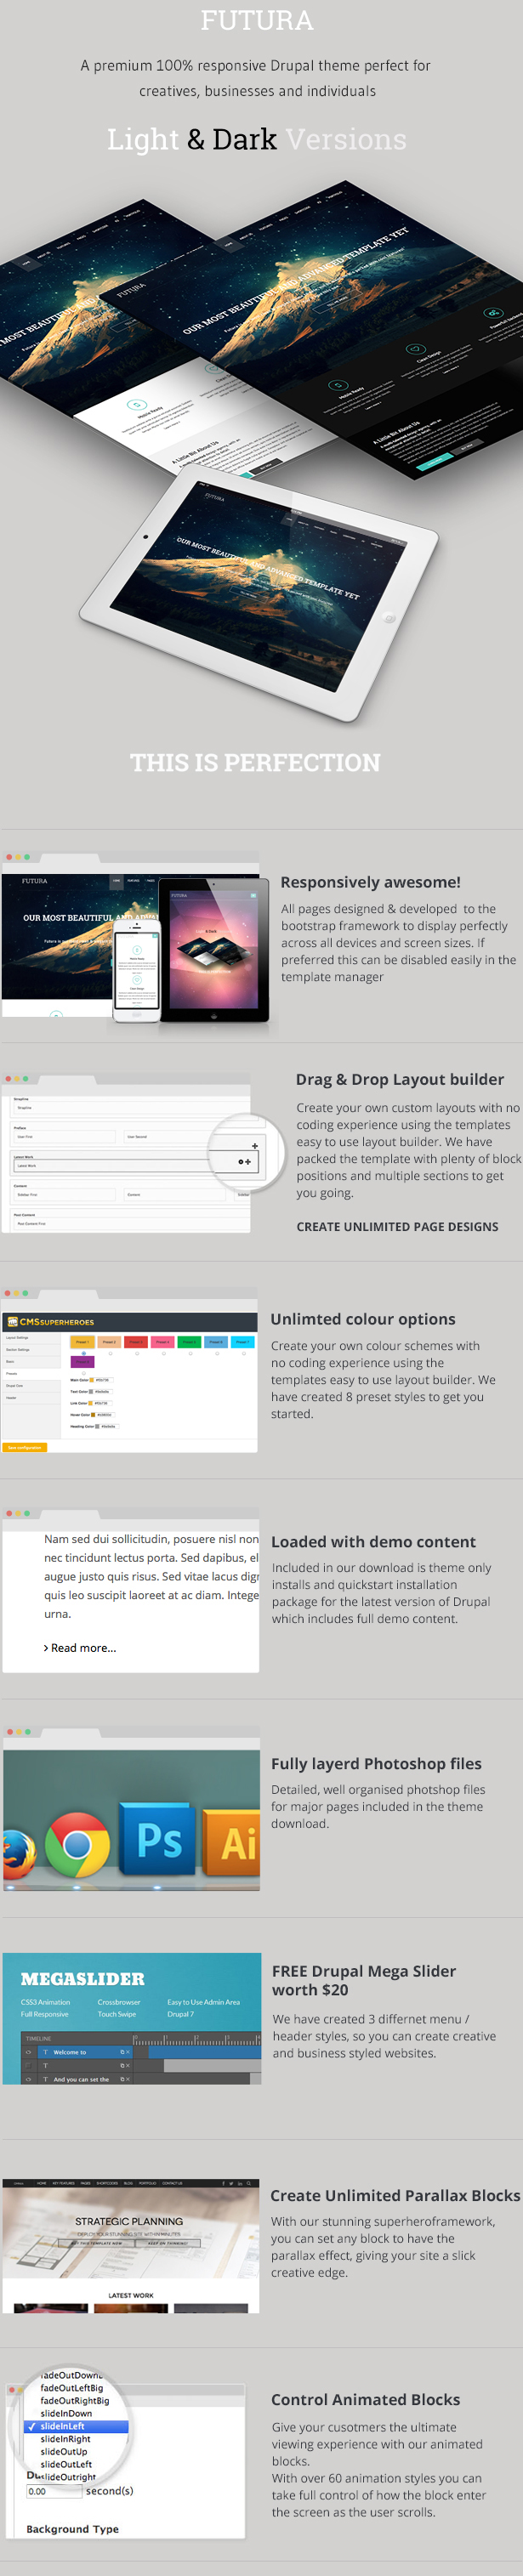 mainimage - Futura, MultiPurpose Creative Drupal Theme